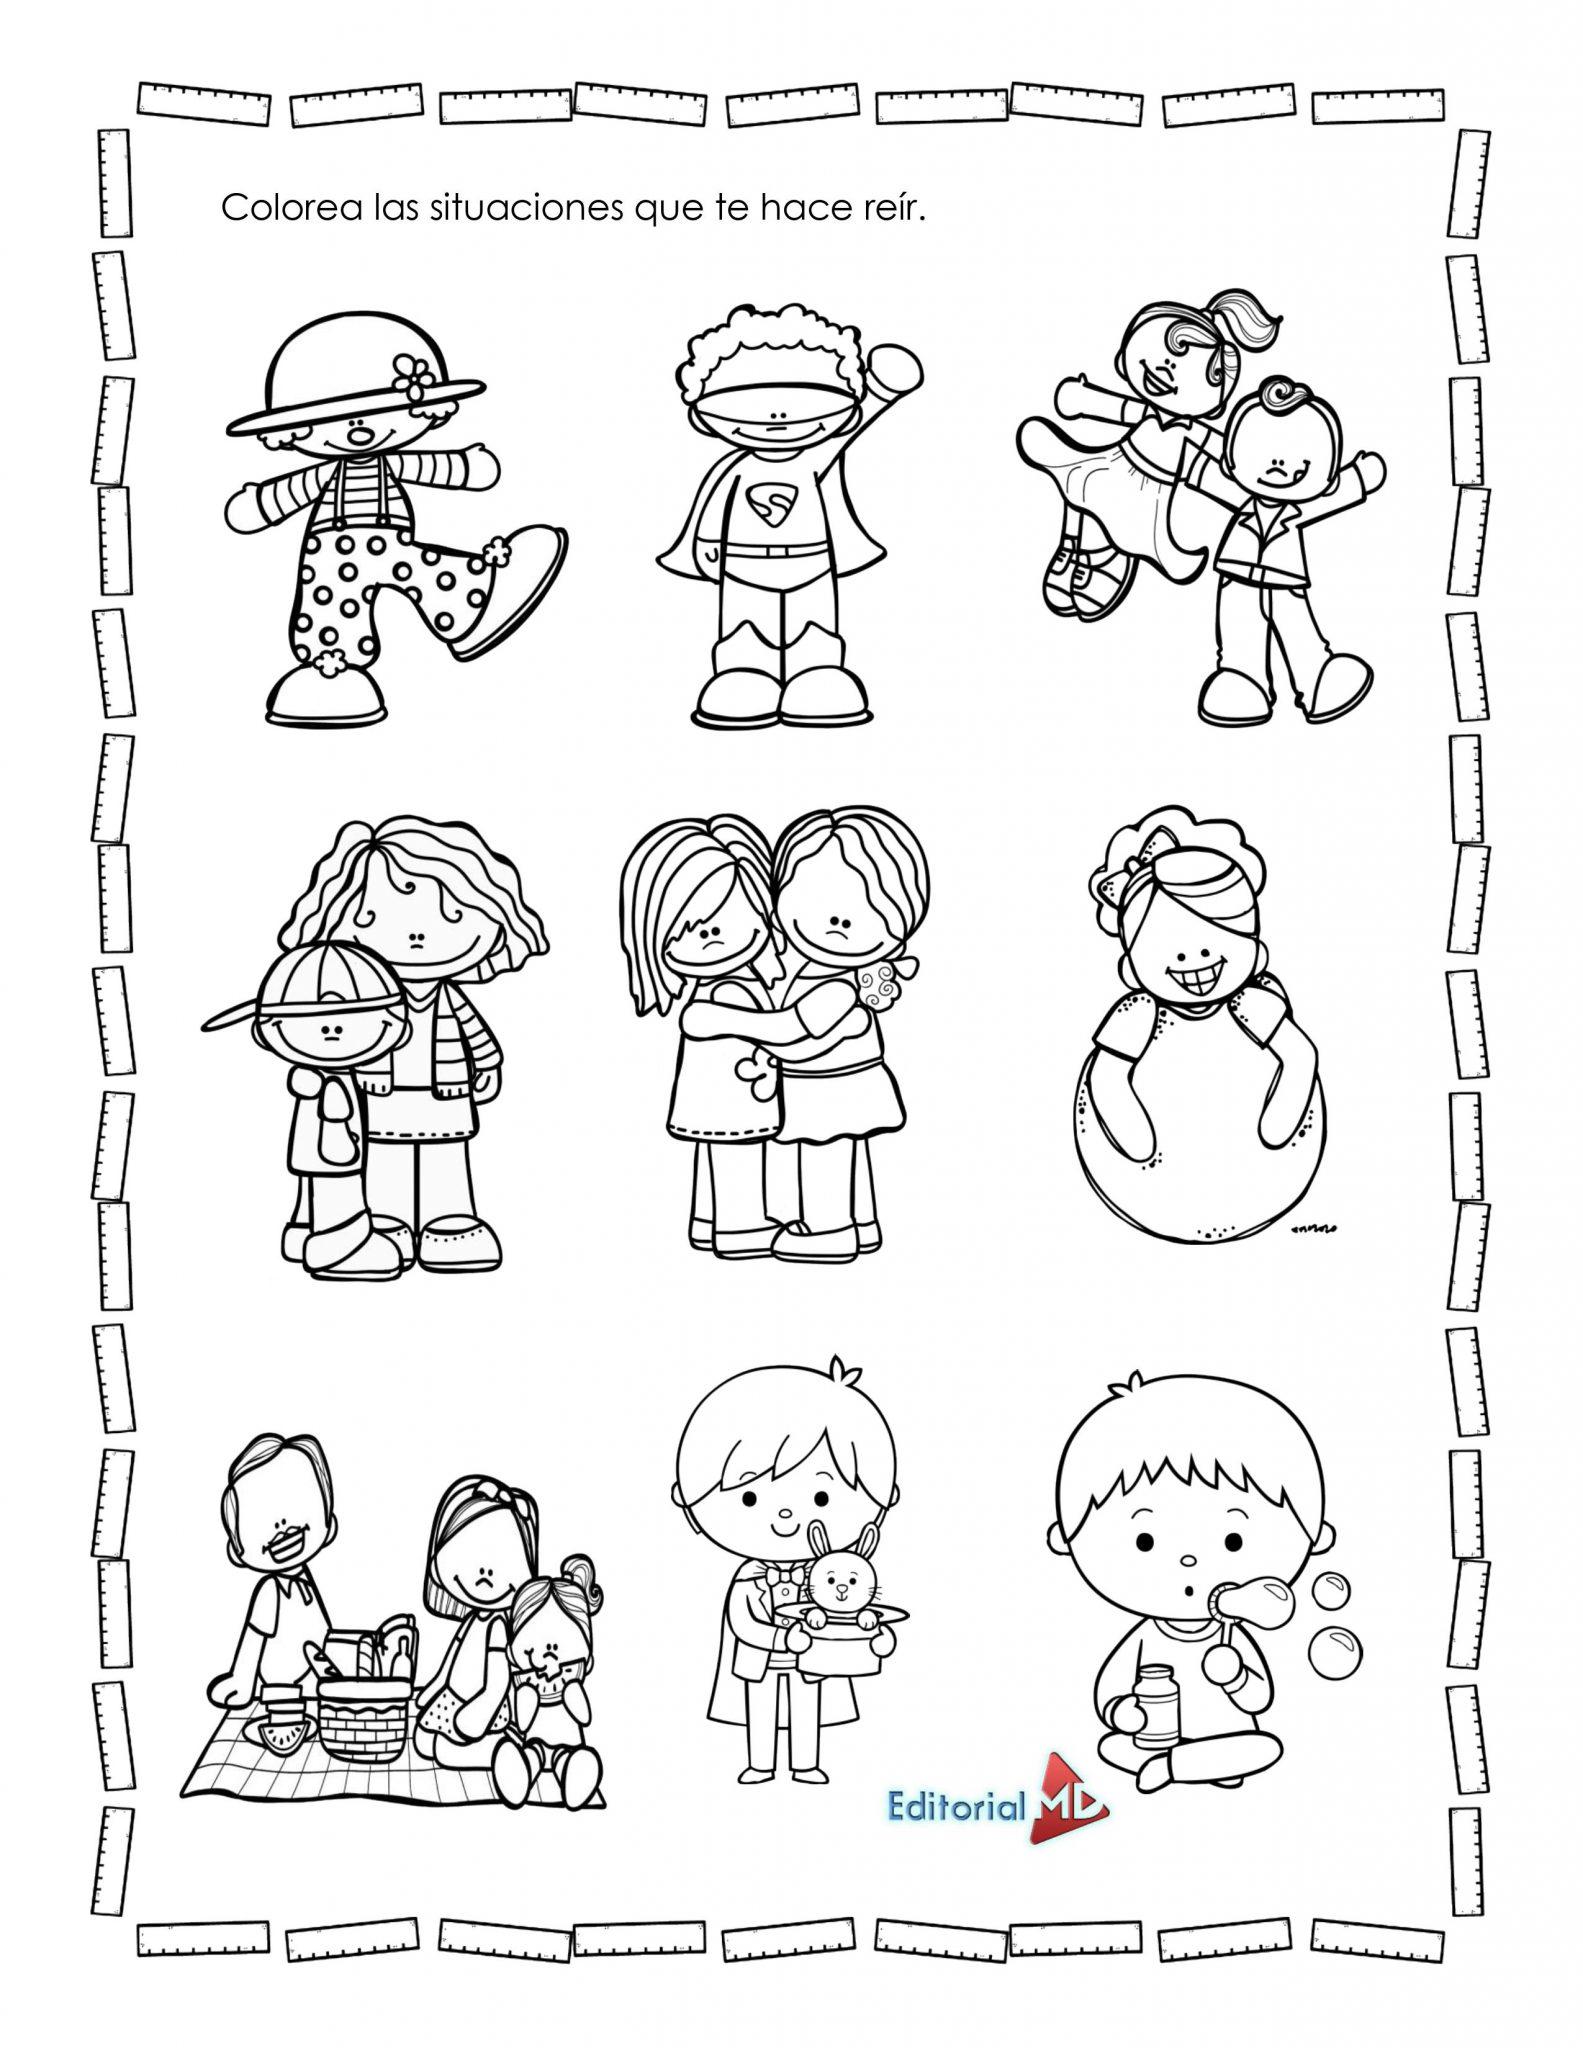 Ejemplo Material de apoyo semana 32 preescolar 02